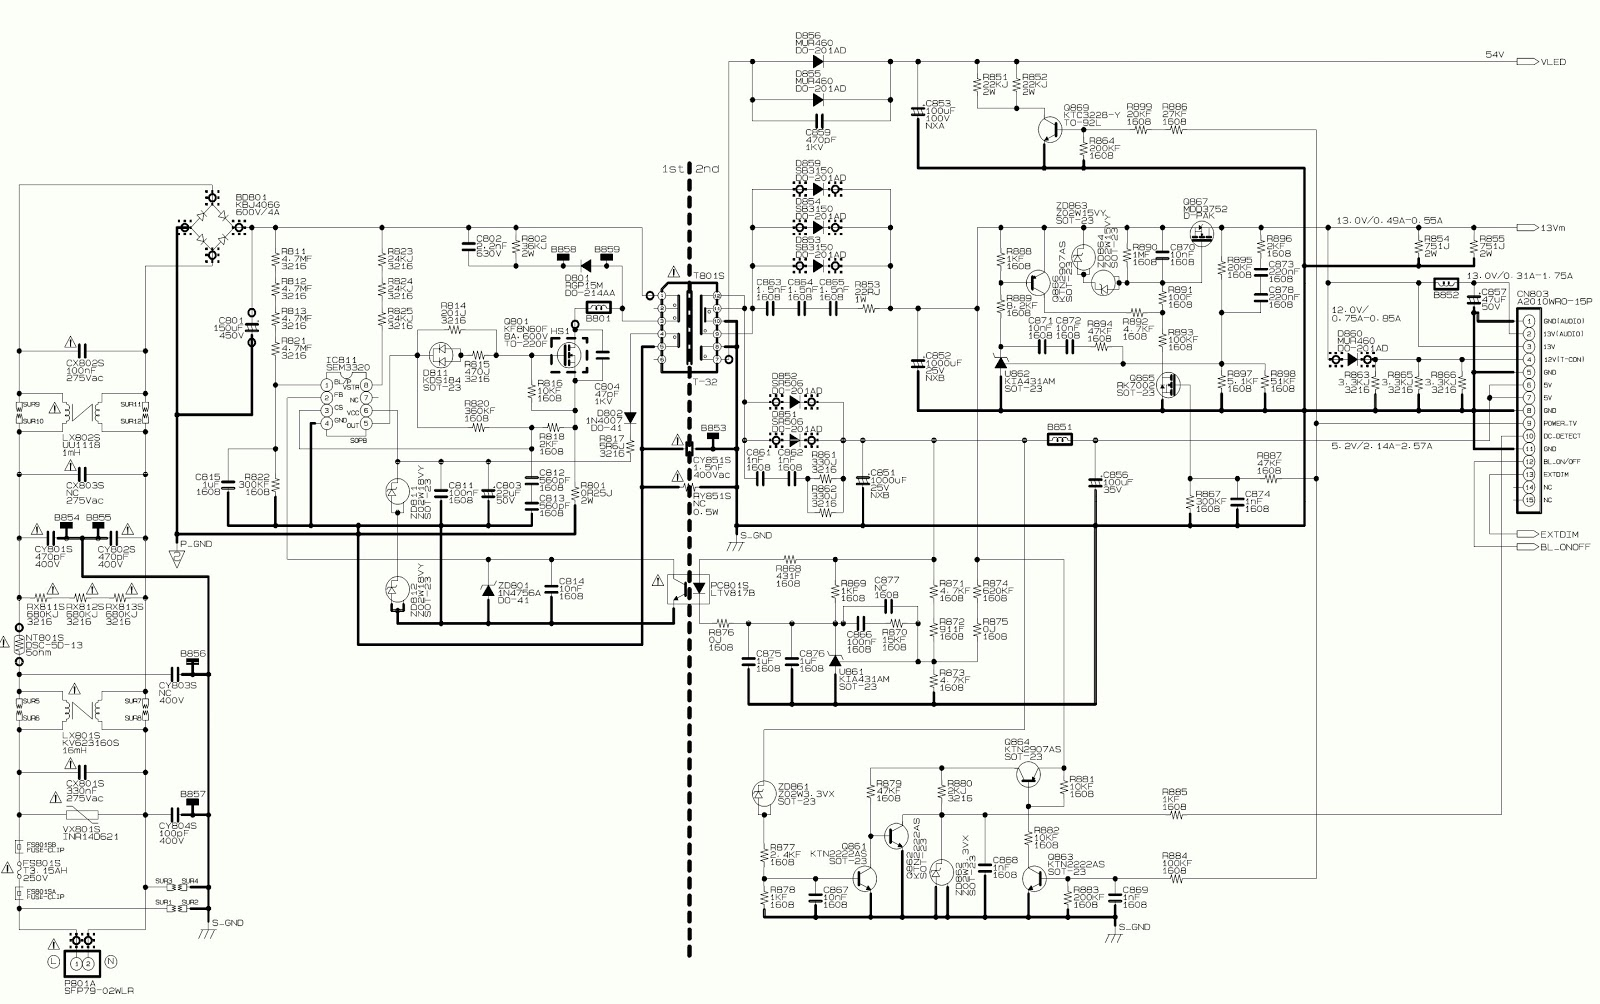 medium resolution of toshiba 39l2300 toshiba 32l2300 smps circuit diagram power supply